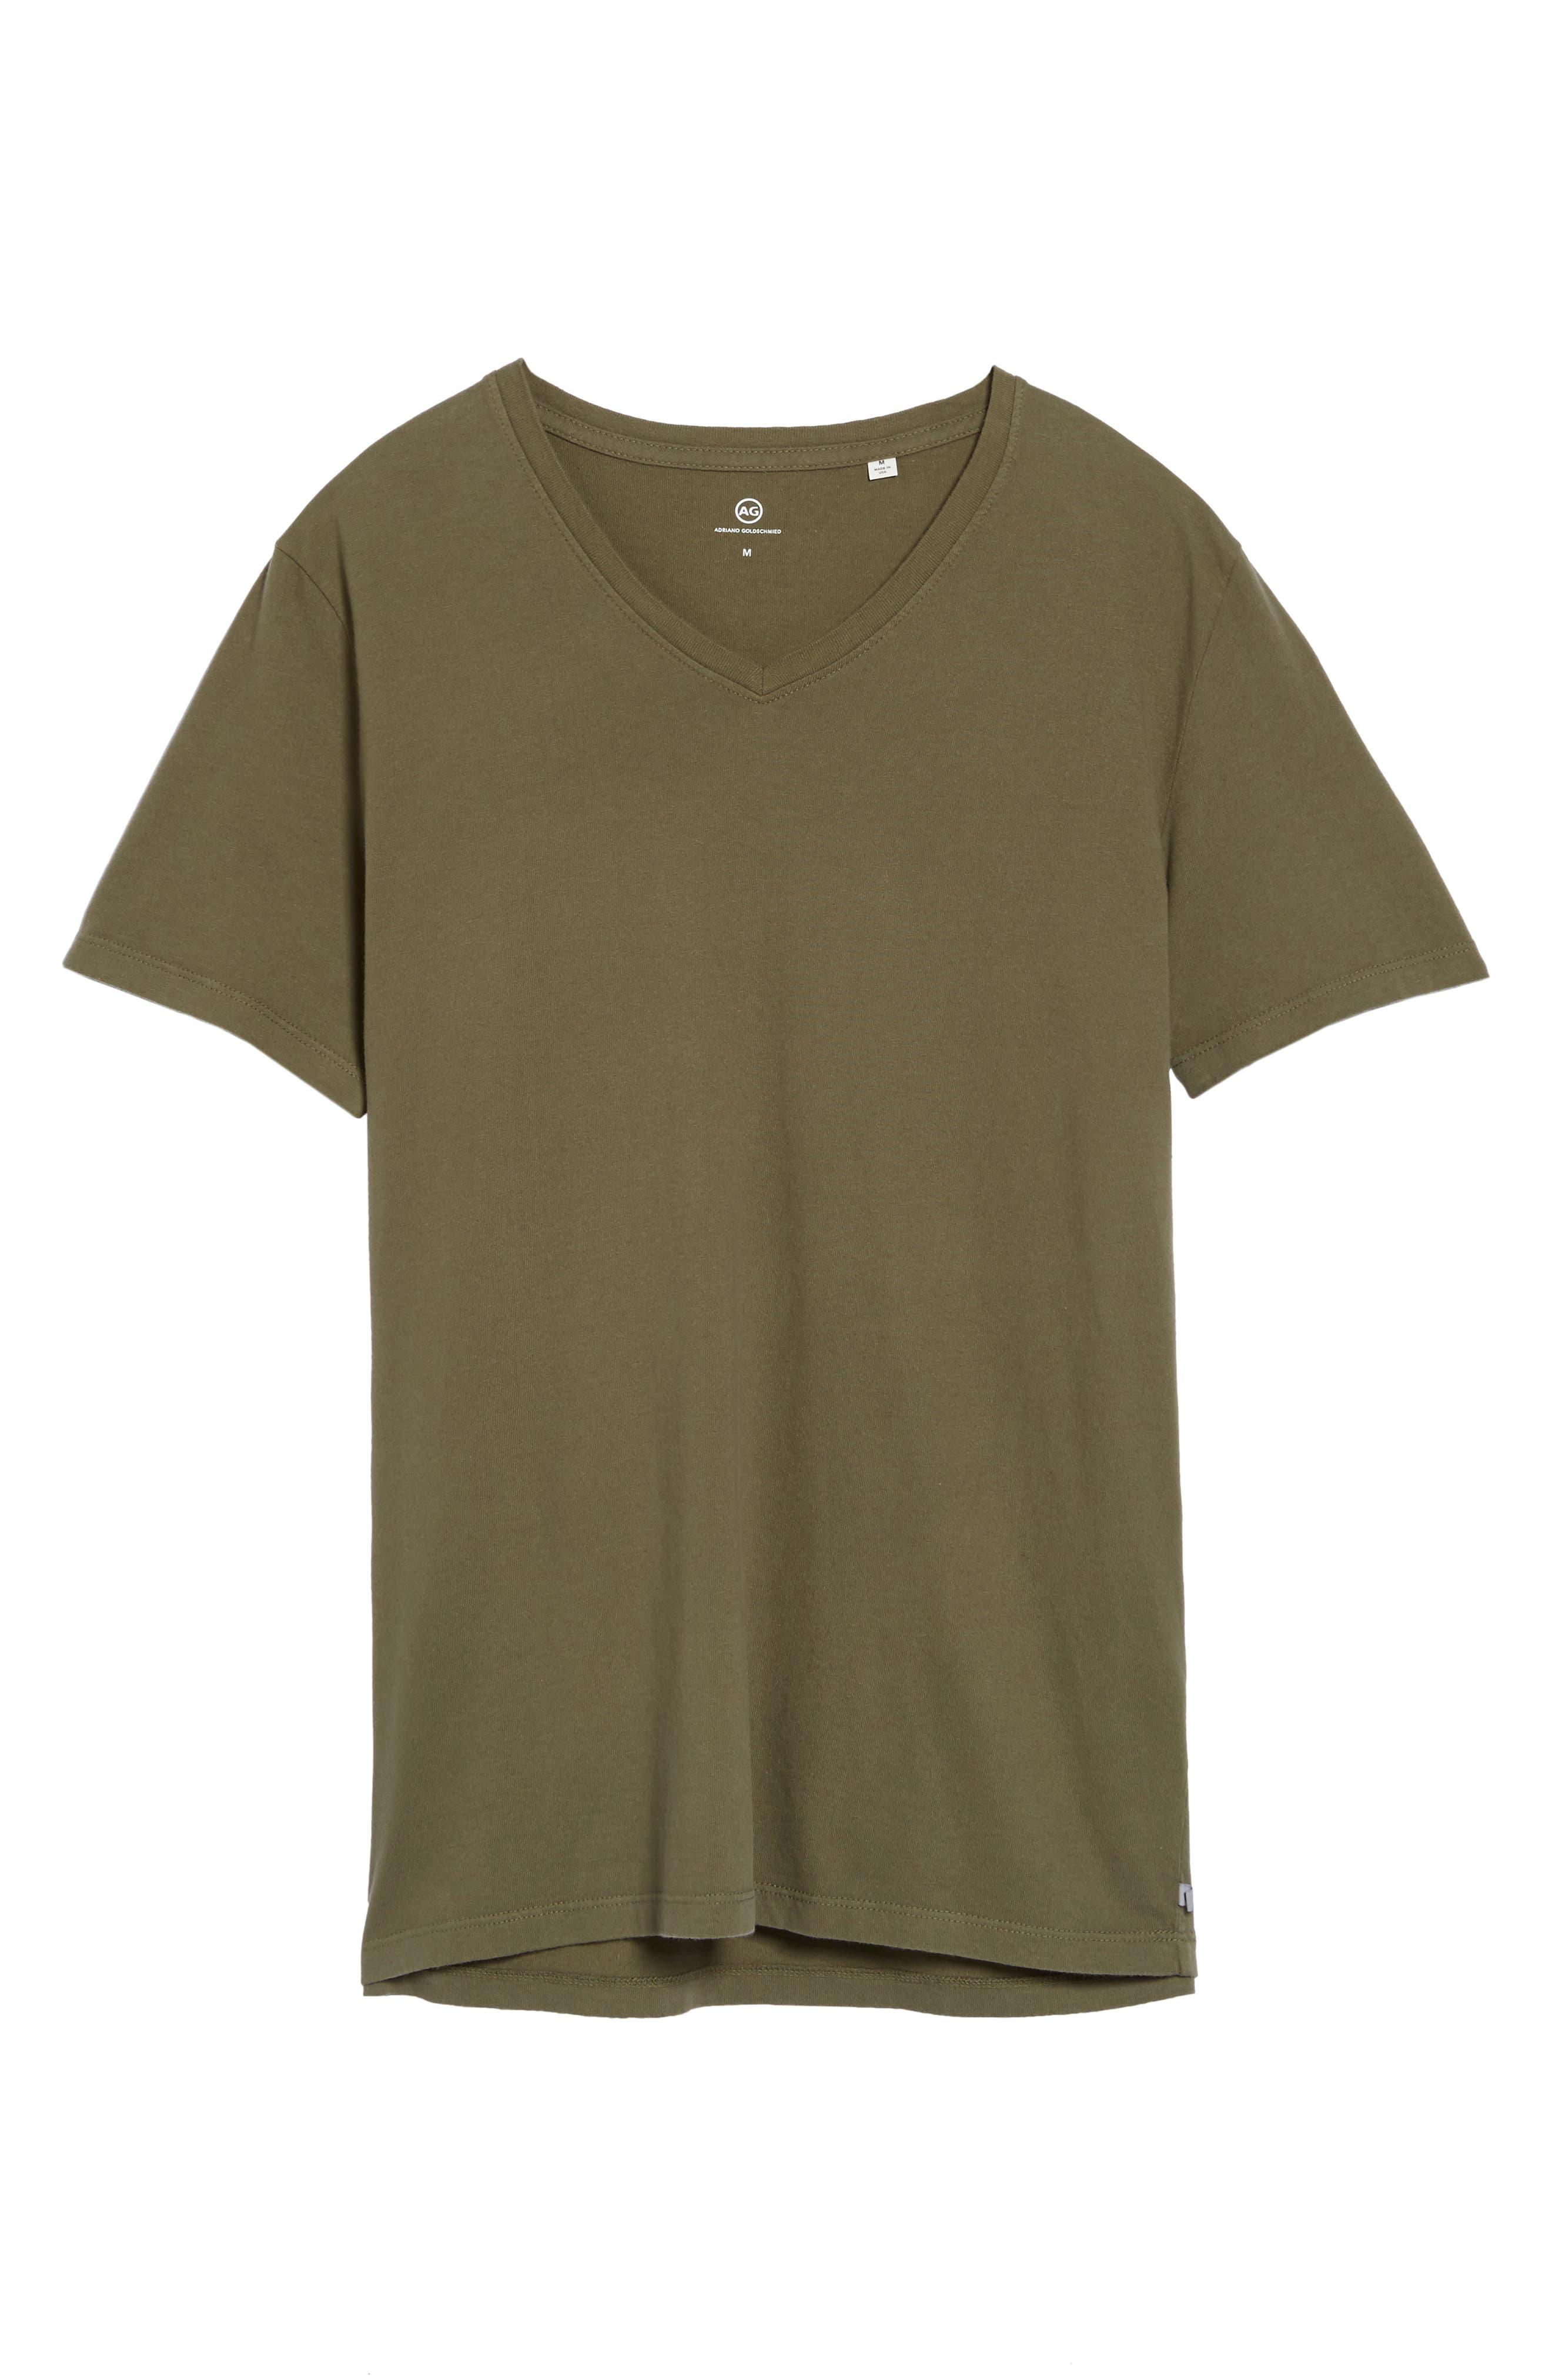 'Commute' V-Neck T-Shirt,                             Alternate thumbnail 6, color,                             396